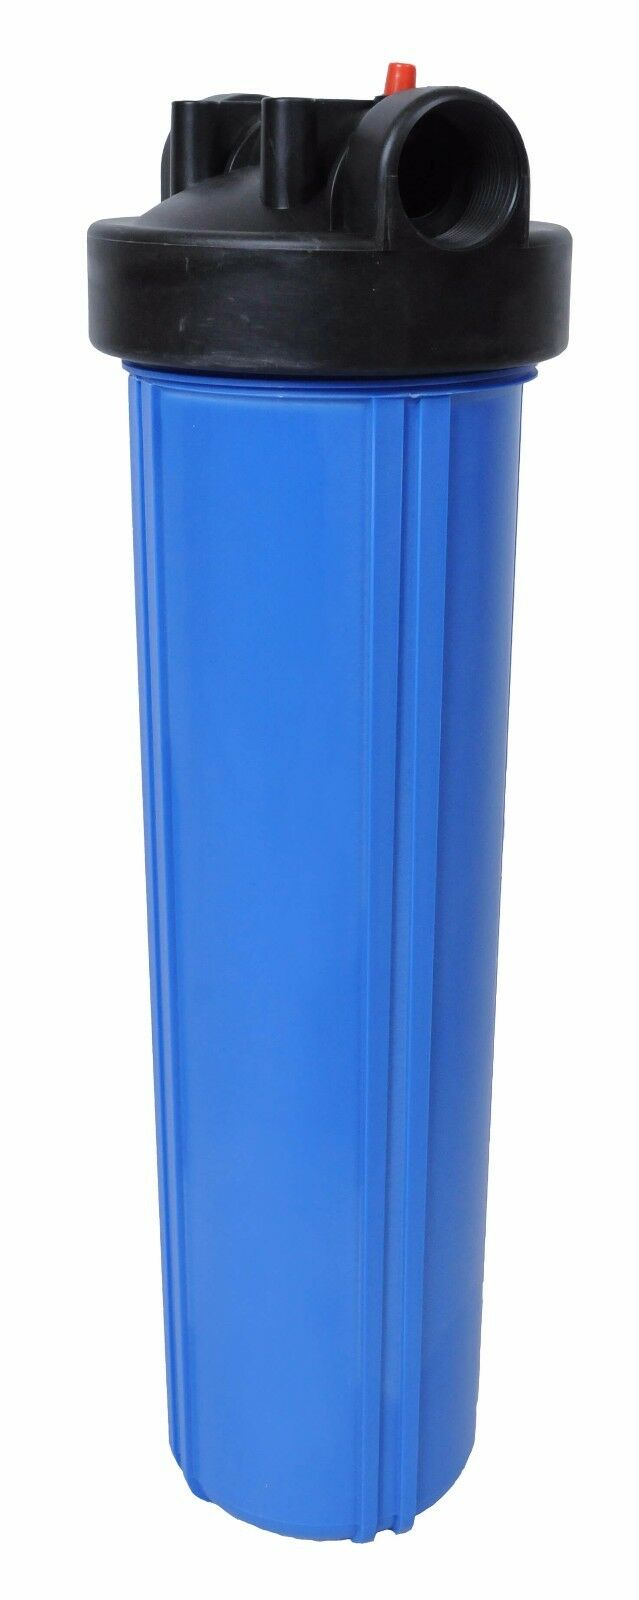 20 20 20  BIG Blau HAUSHALT-WASSERFILTER GEHÄUSE POOL GARTENFILTER FILTERGEHÄUSE 1b89e4